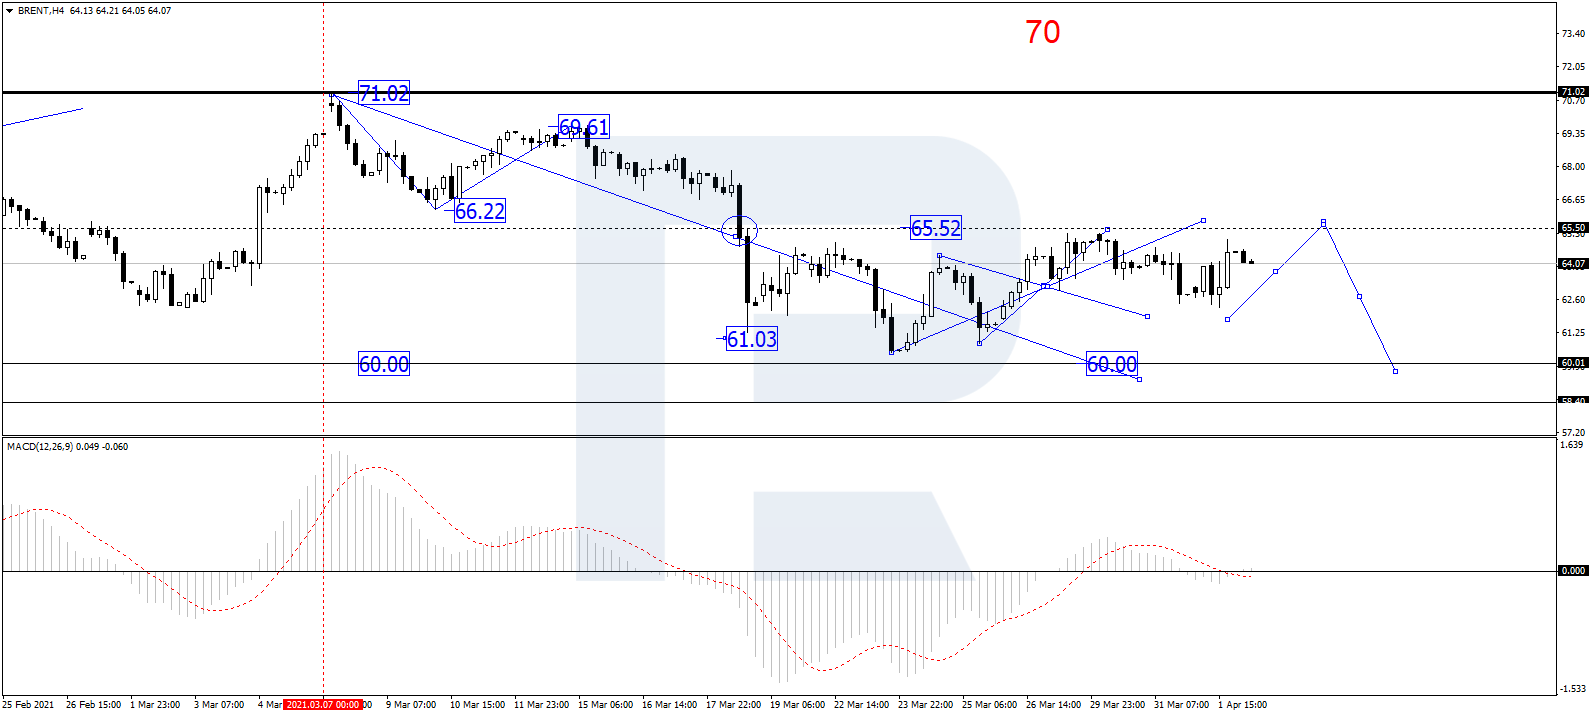 Brent Crude Oil Technical Chart